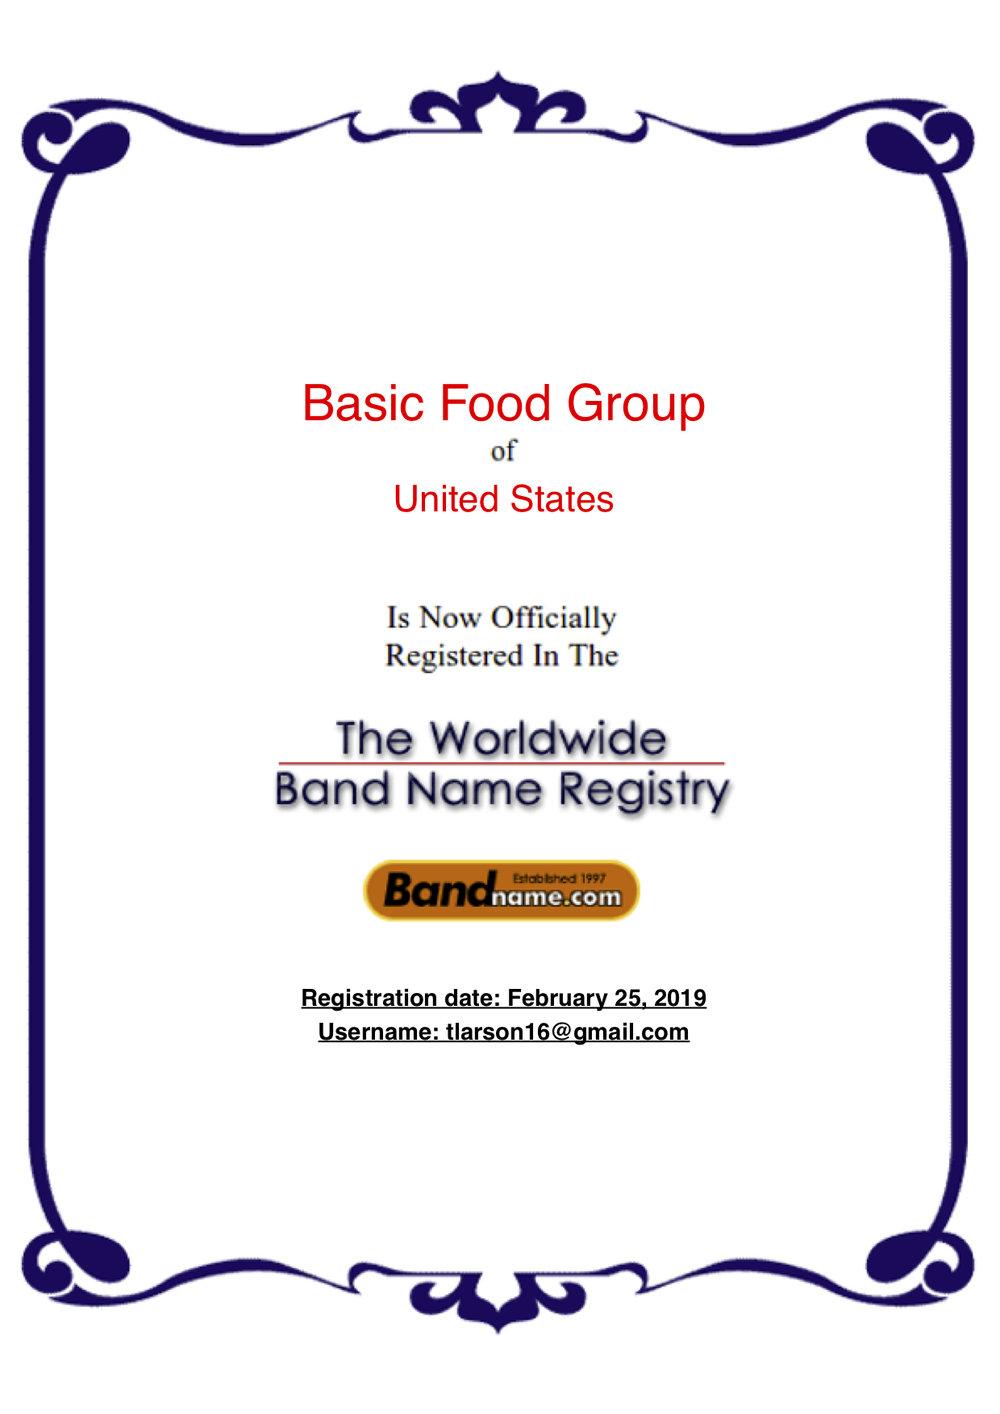 BasicFoodGroup Worldwide Band Name Registry.jpg